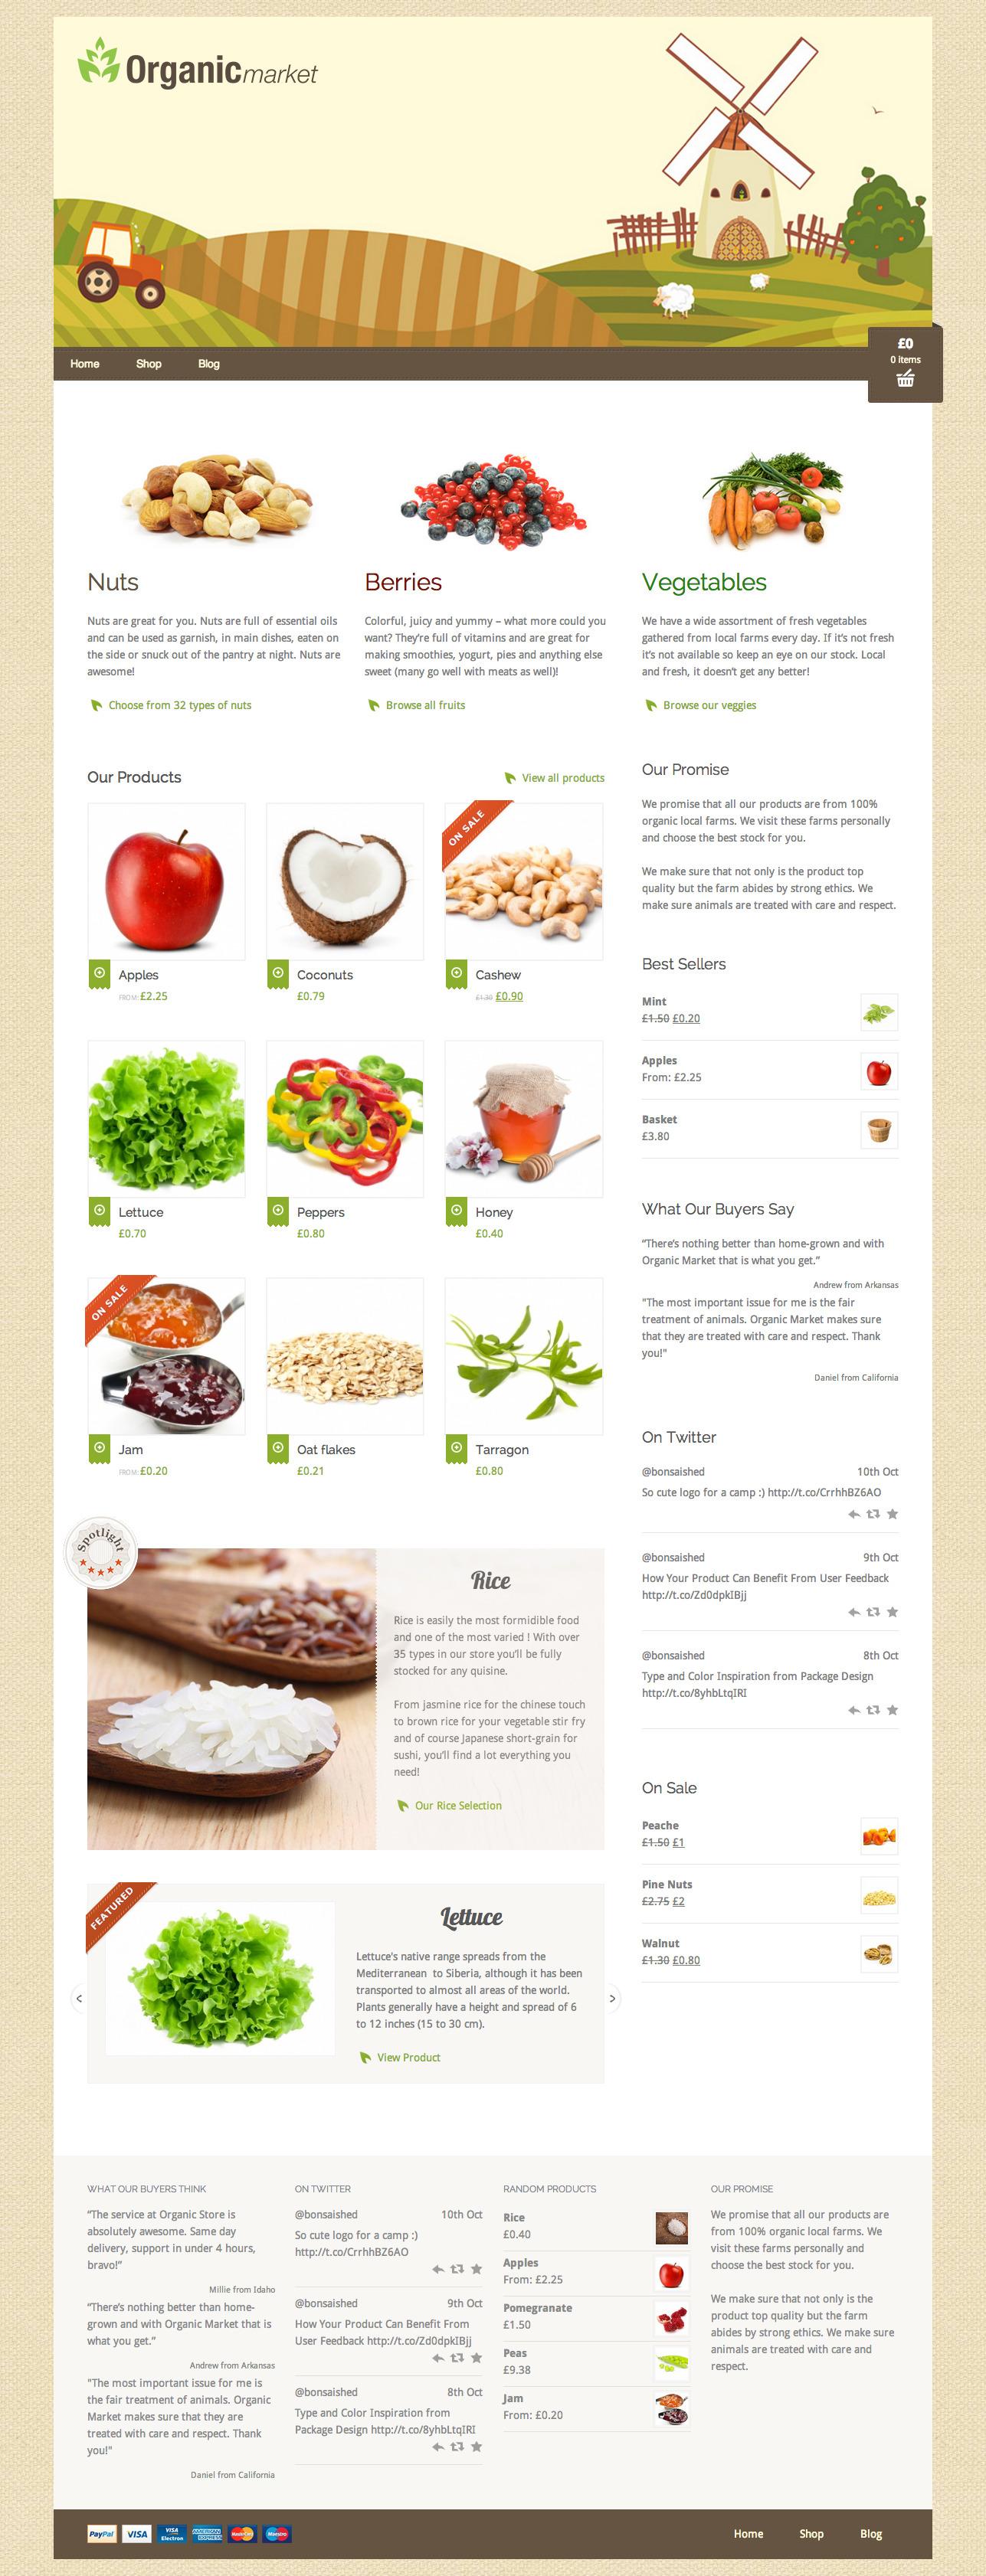 Organic Market - Friendly Ecommerce